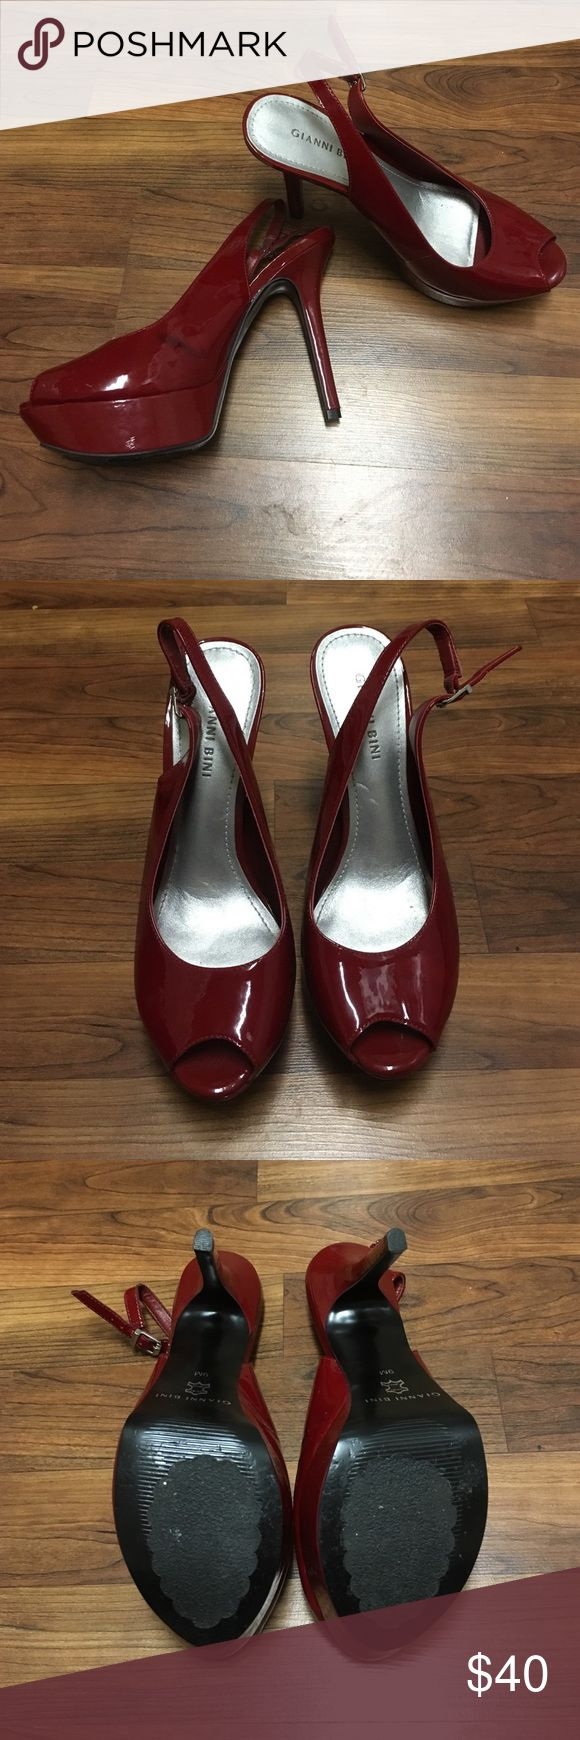 Gianni Bini Red Platform Pumps Red Platform Pumps (worn once for formal) very comfy! Gianni Bini Shoes Platforms